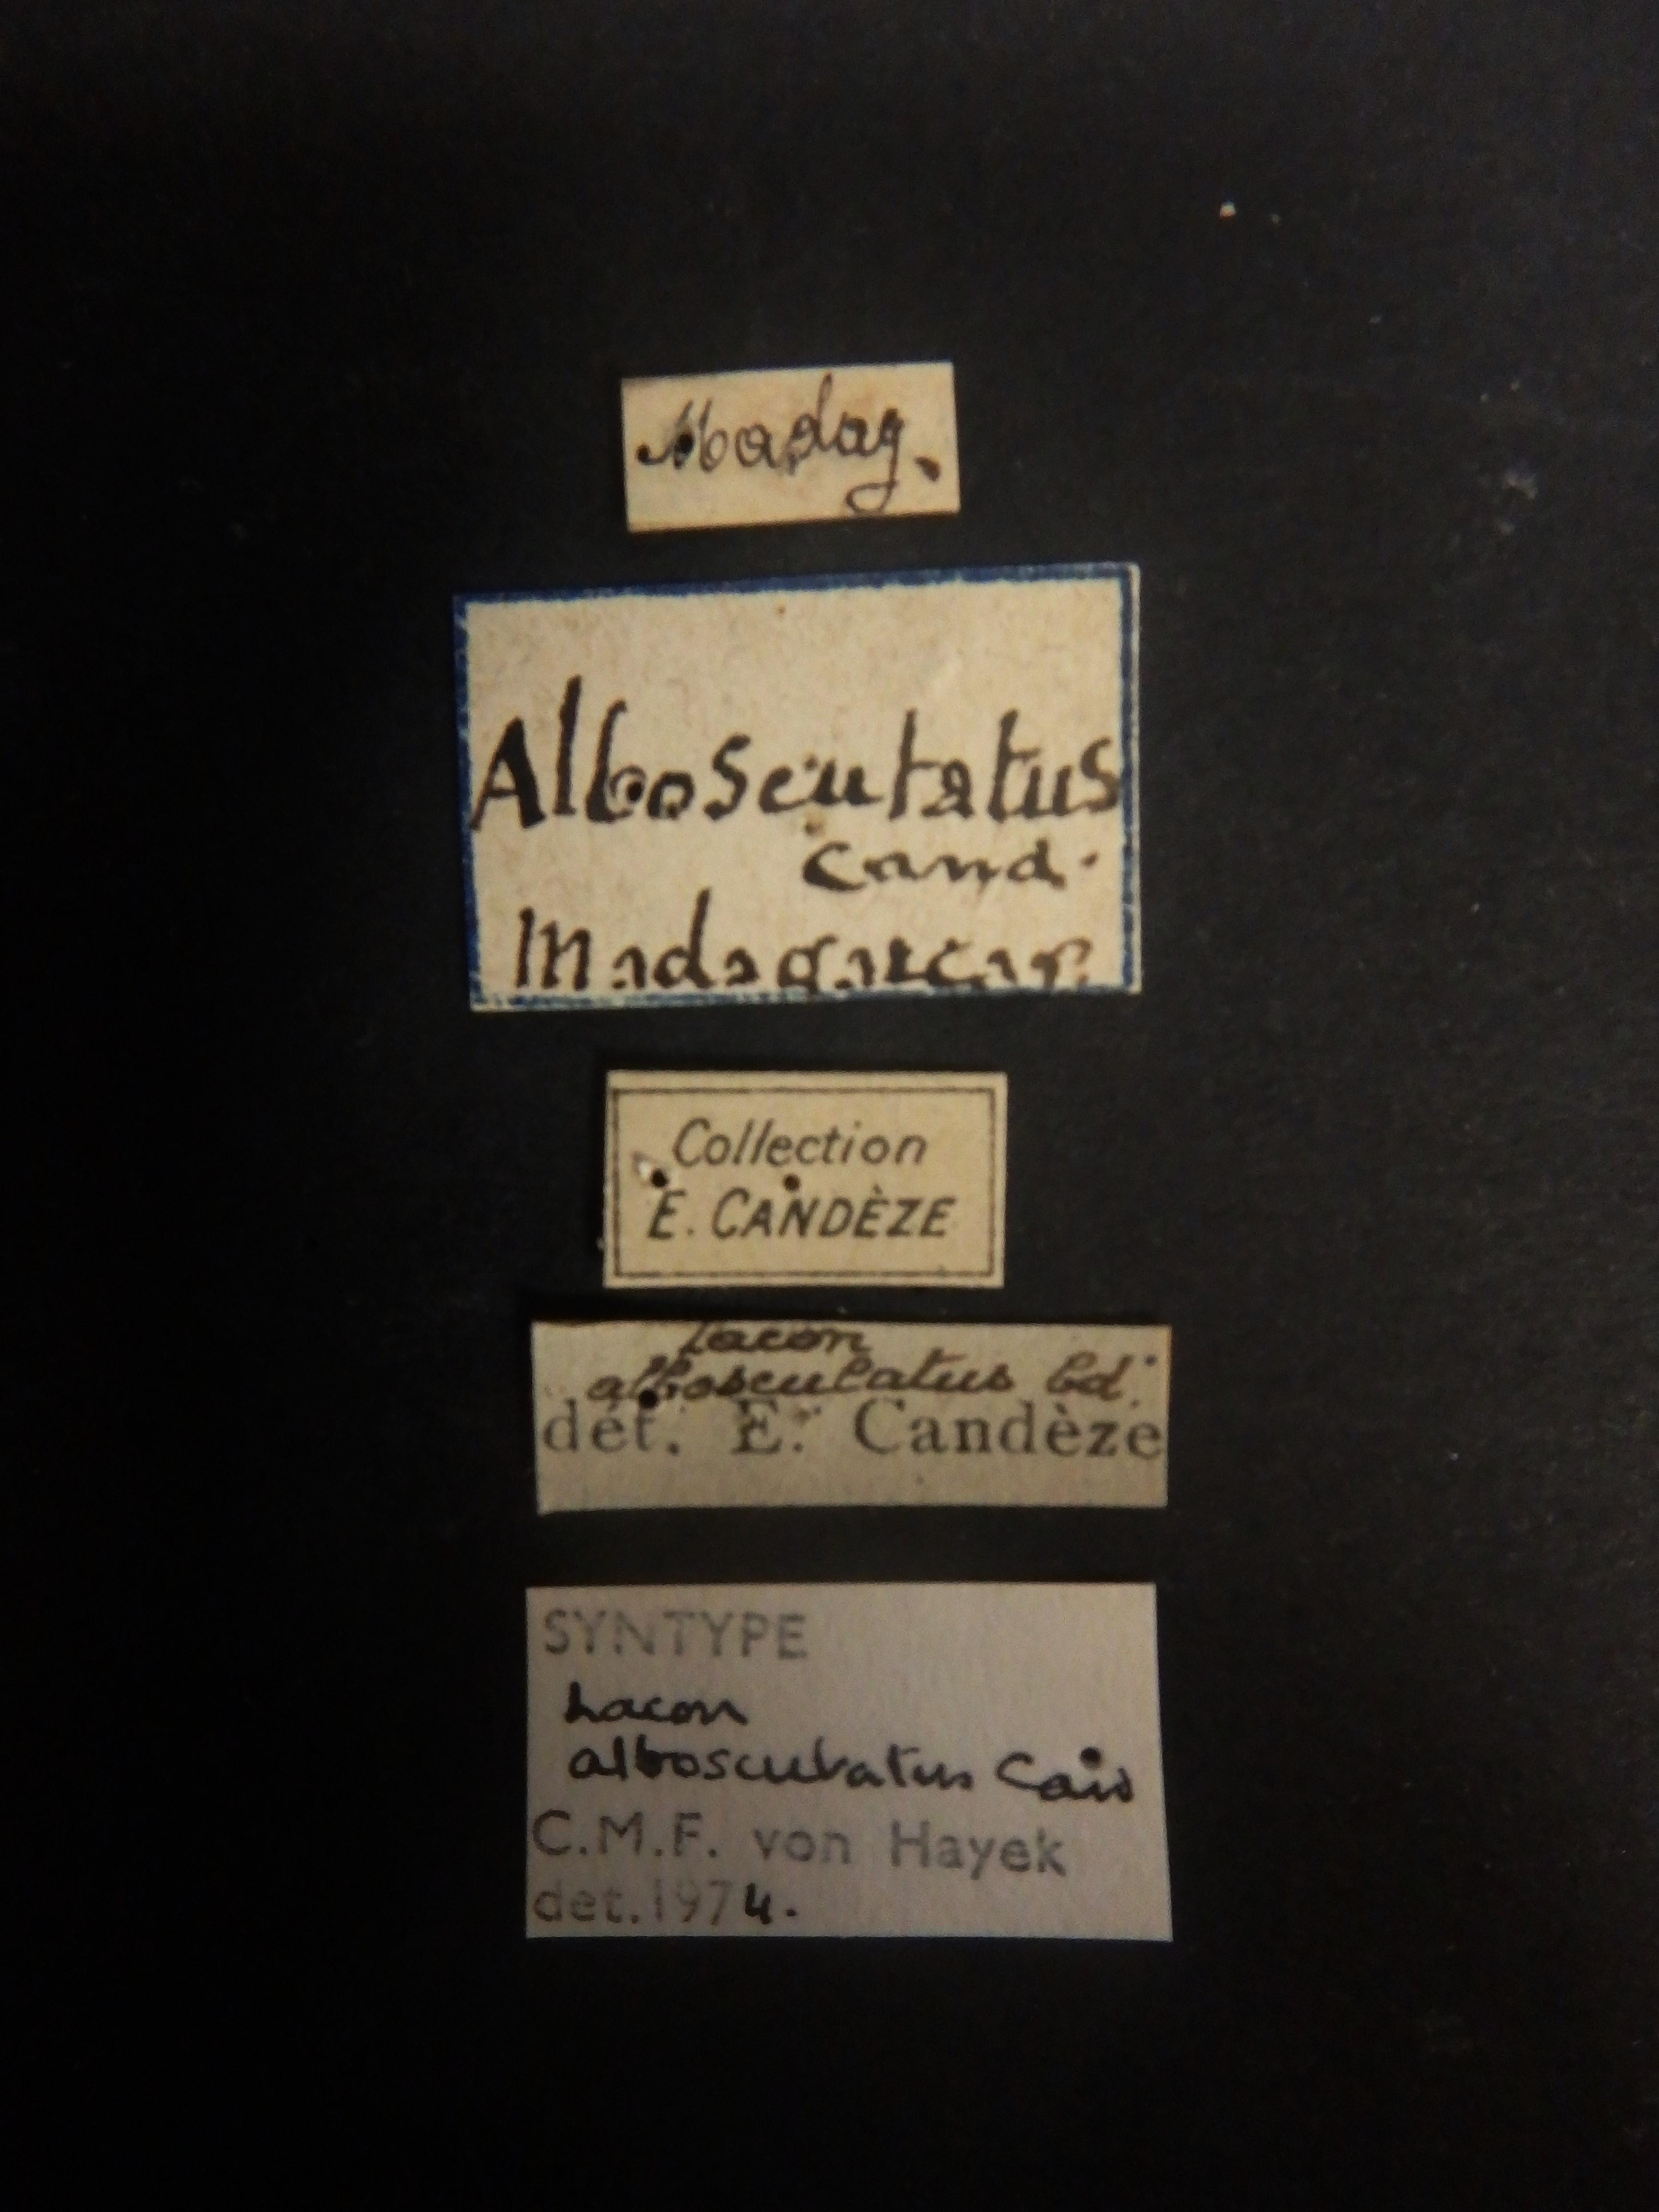 Lacon alboscutatus st Labels.JPG